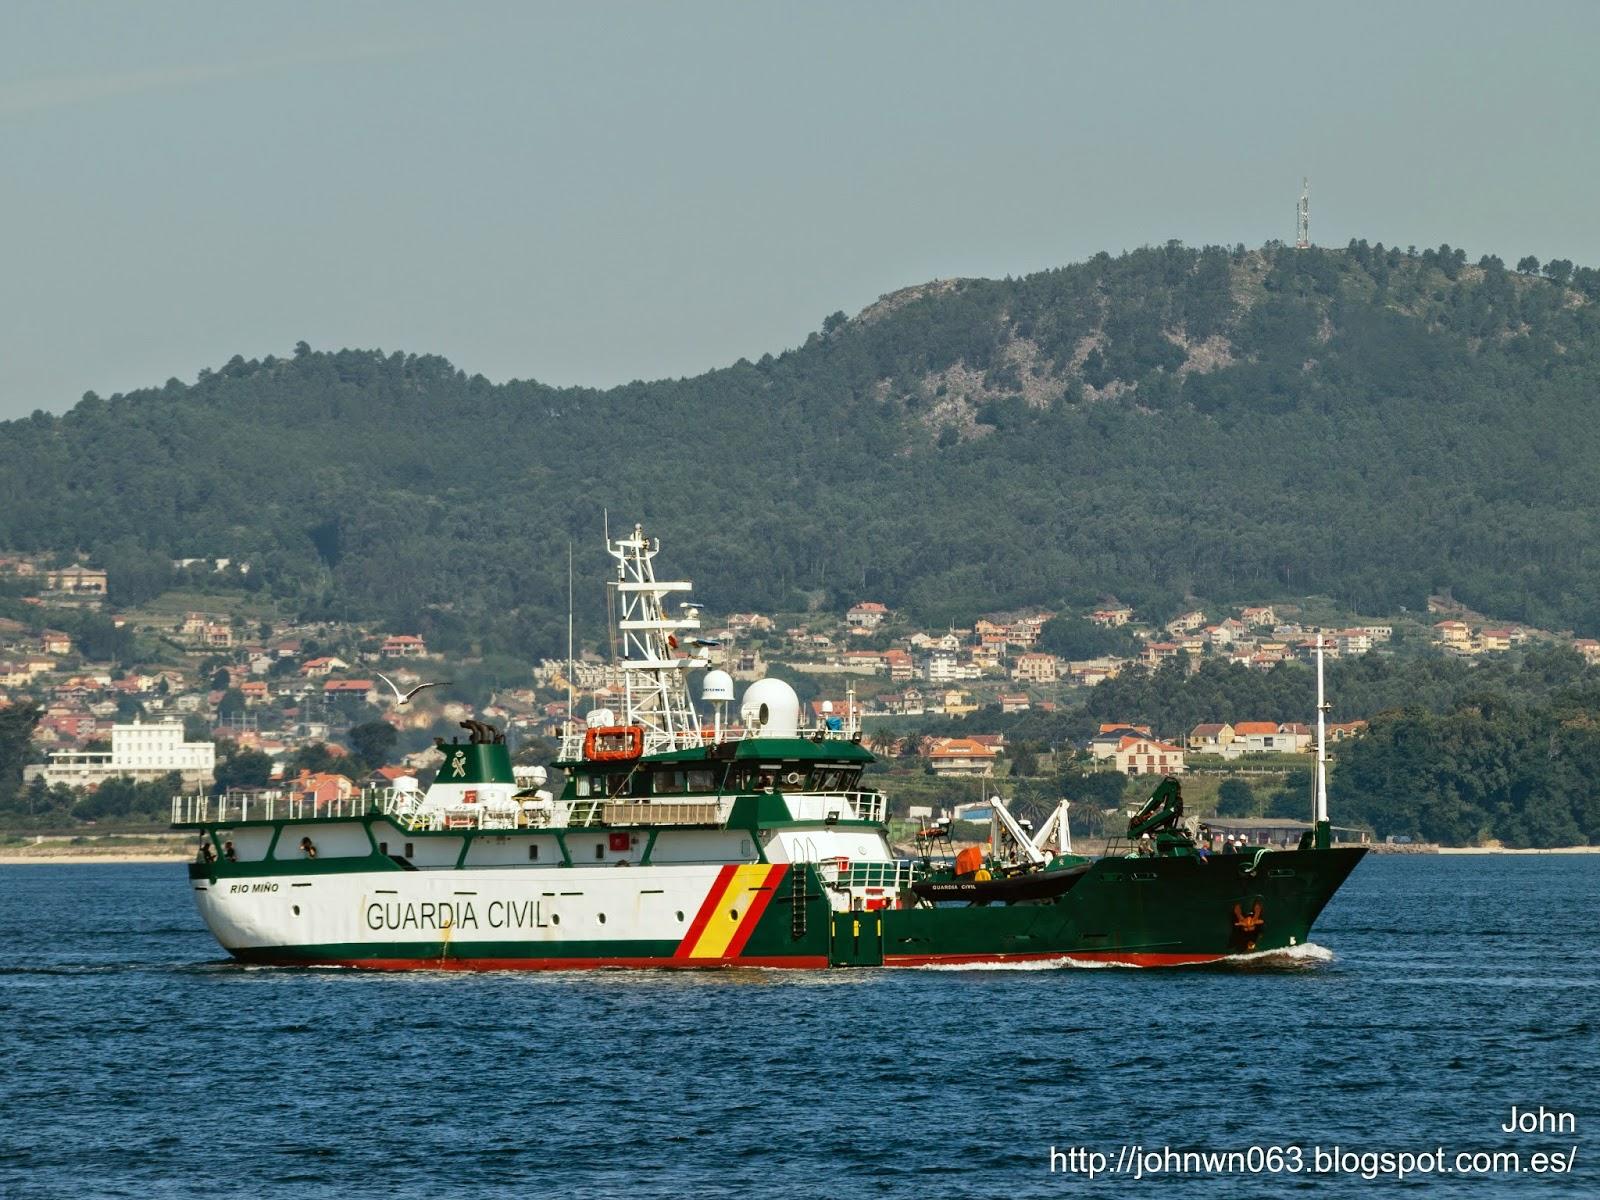 fotos de barcos, imagenes de barcos, semar, guardia civil, rio miño, vigo